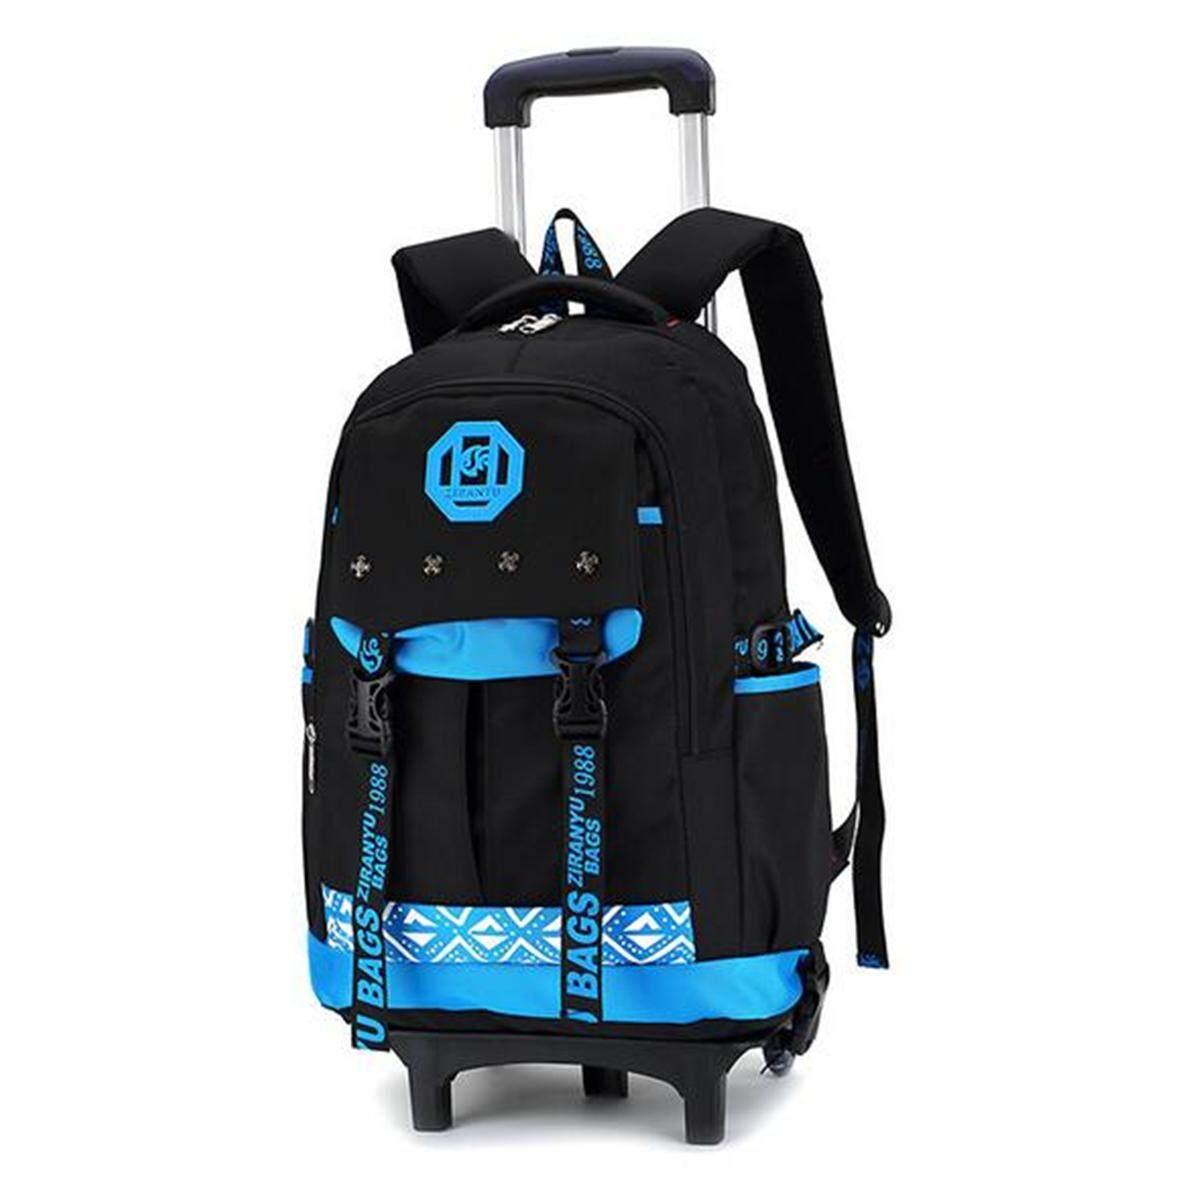 9e2efe12db Children Trolley Backpack Travel Rucksack Luggage School Bag Handbag With  Wheels   2 wheel